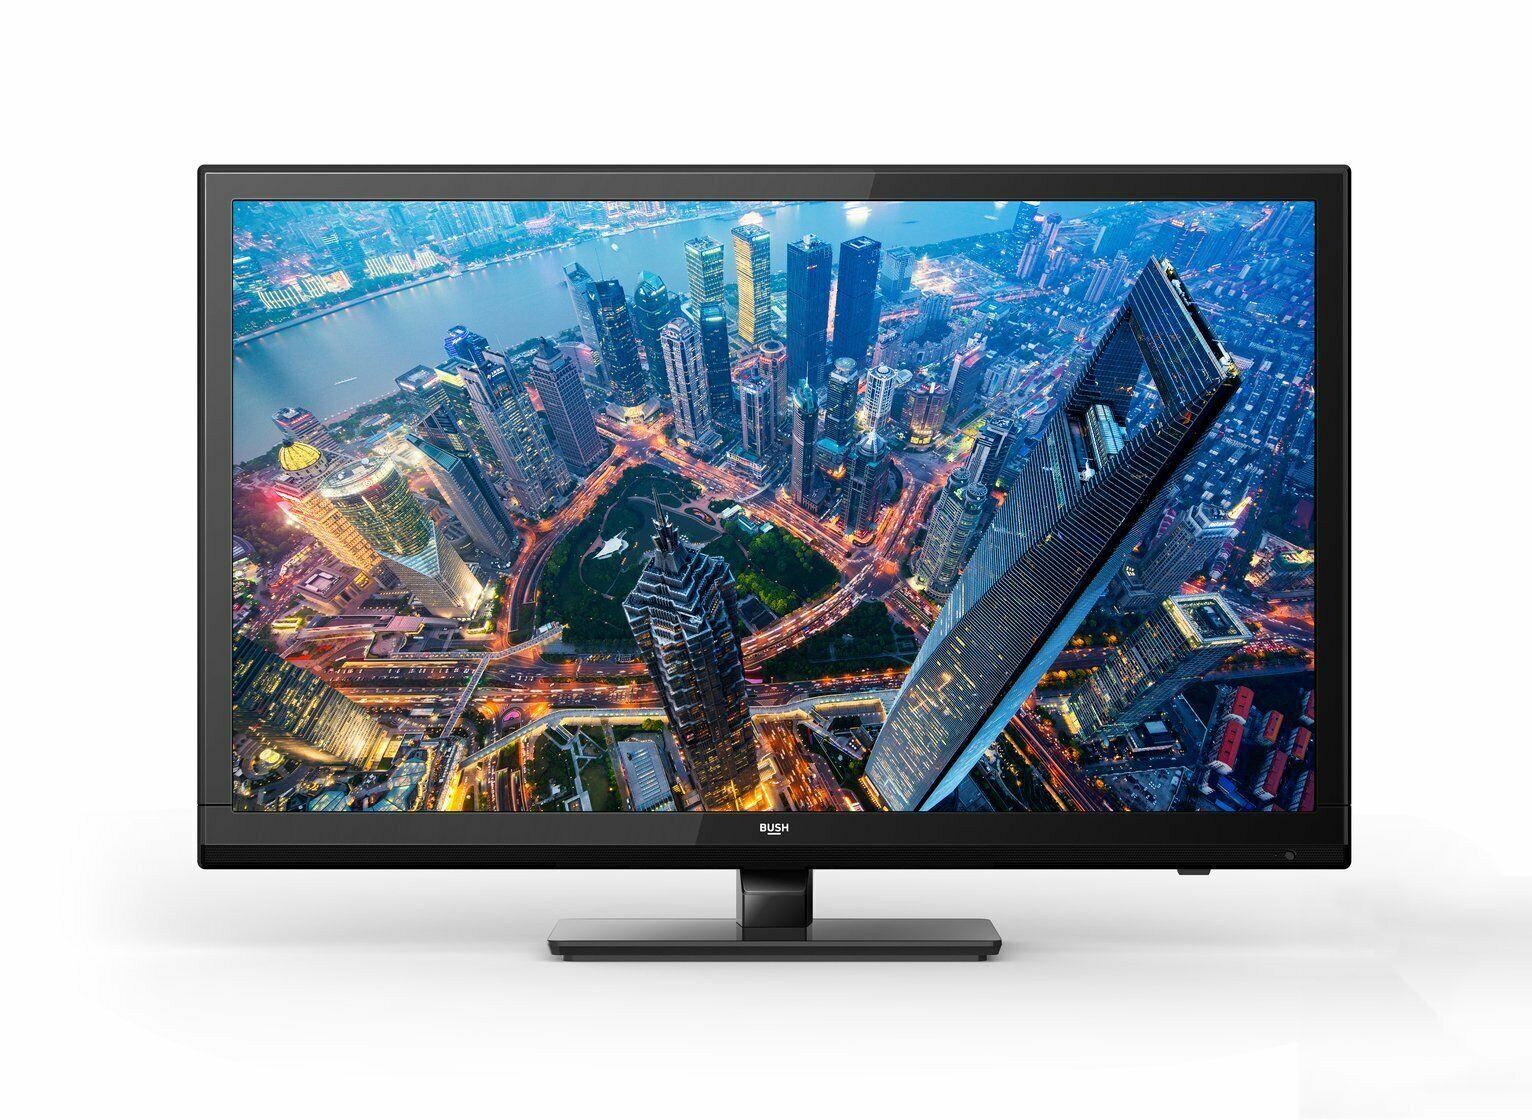 Bush 24 Inch HD Ready LCD TV Black 2019 Model £99.99 at Argos